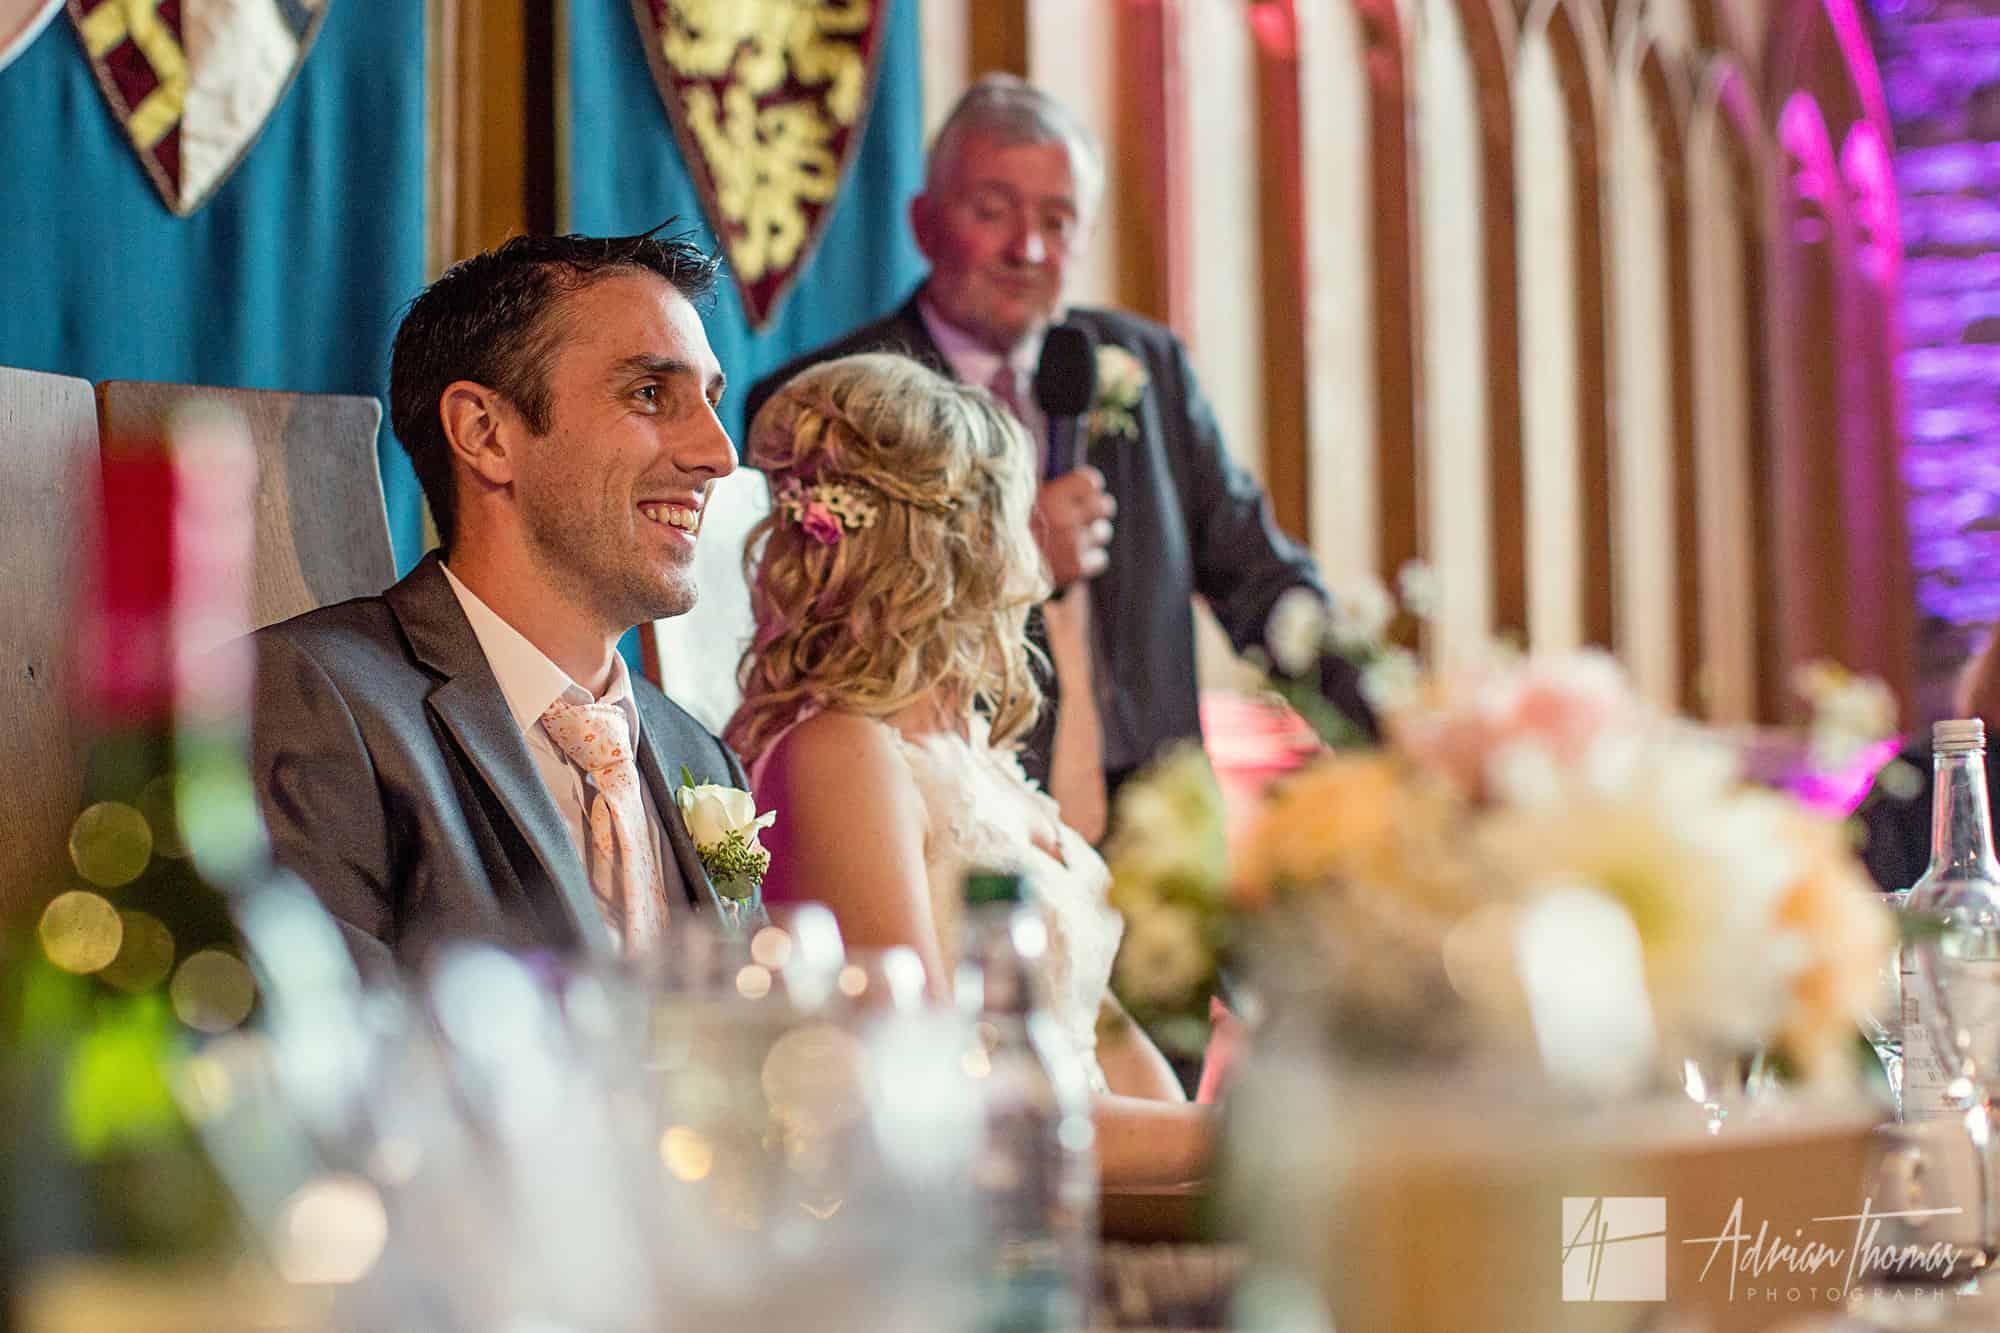 Groom at wedding reception.